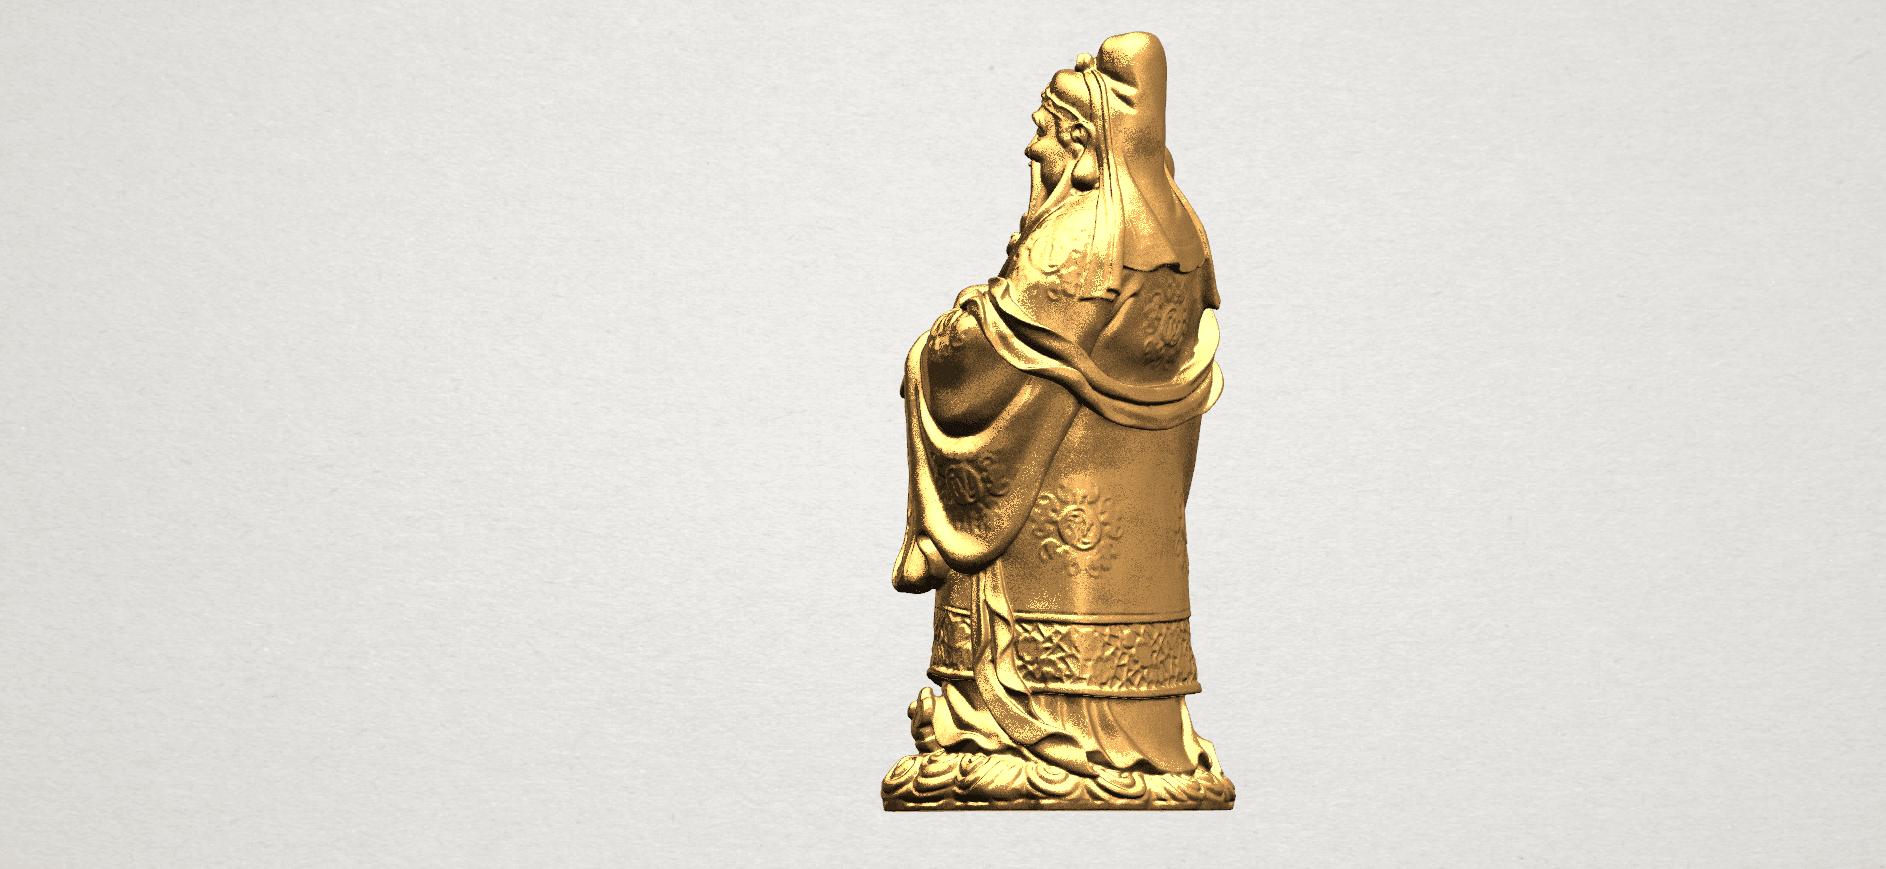 Fook (Fook Look Sao) 80mm - B03.png Download free STL file Fook (Fook Look Sao) • 3D printer template, GeorgesNikkei